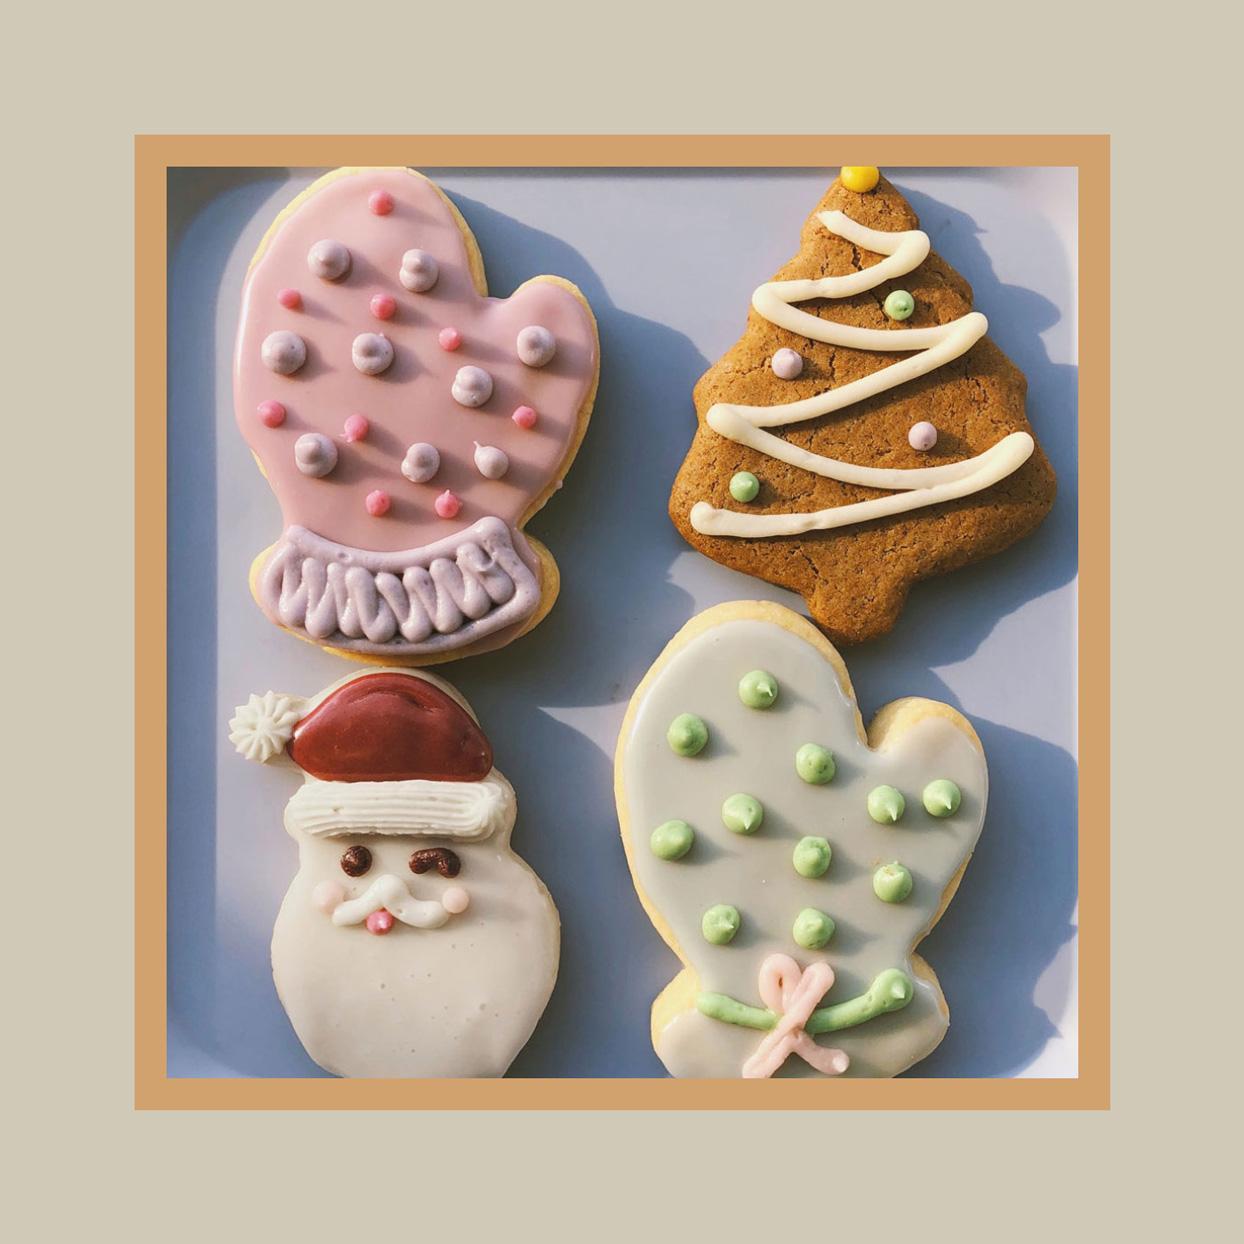 assortment of sugar cookies Rainbow Bakery